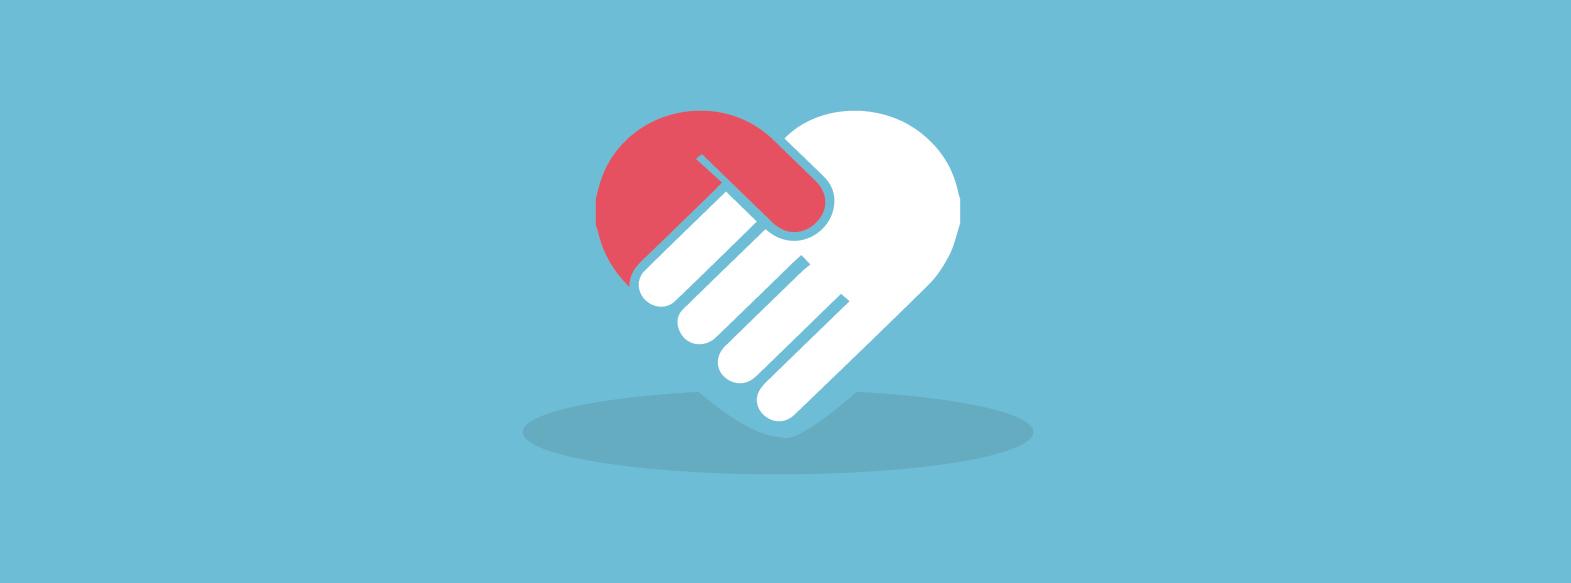 hand shake icon design vector illustration